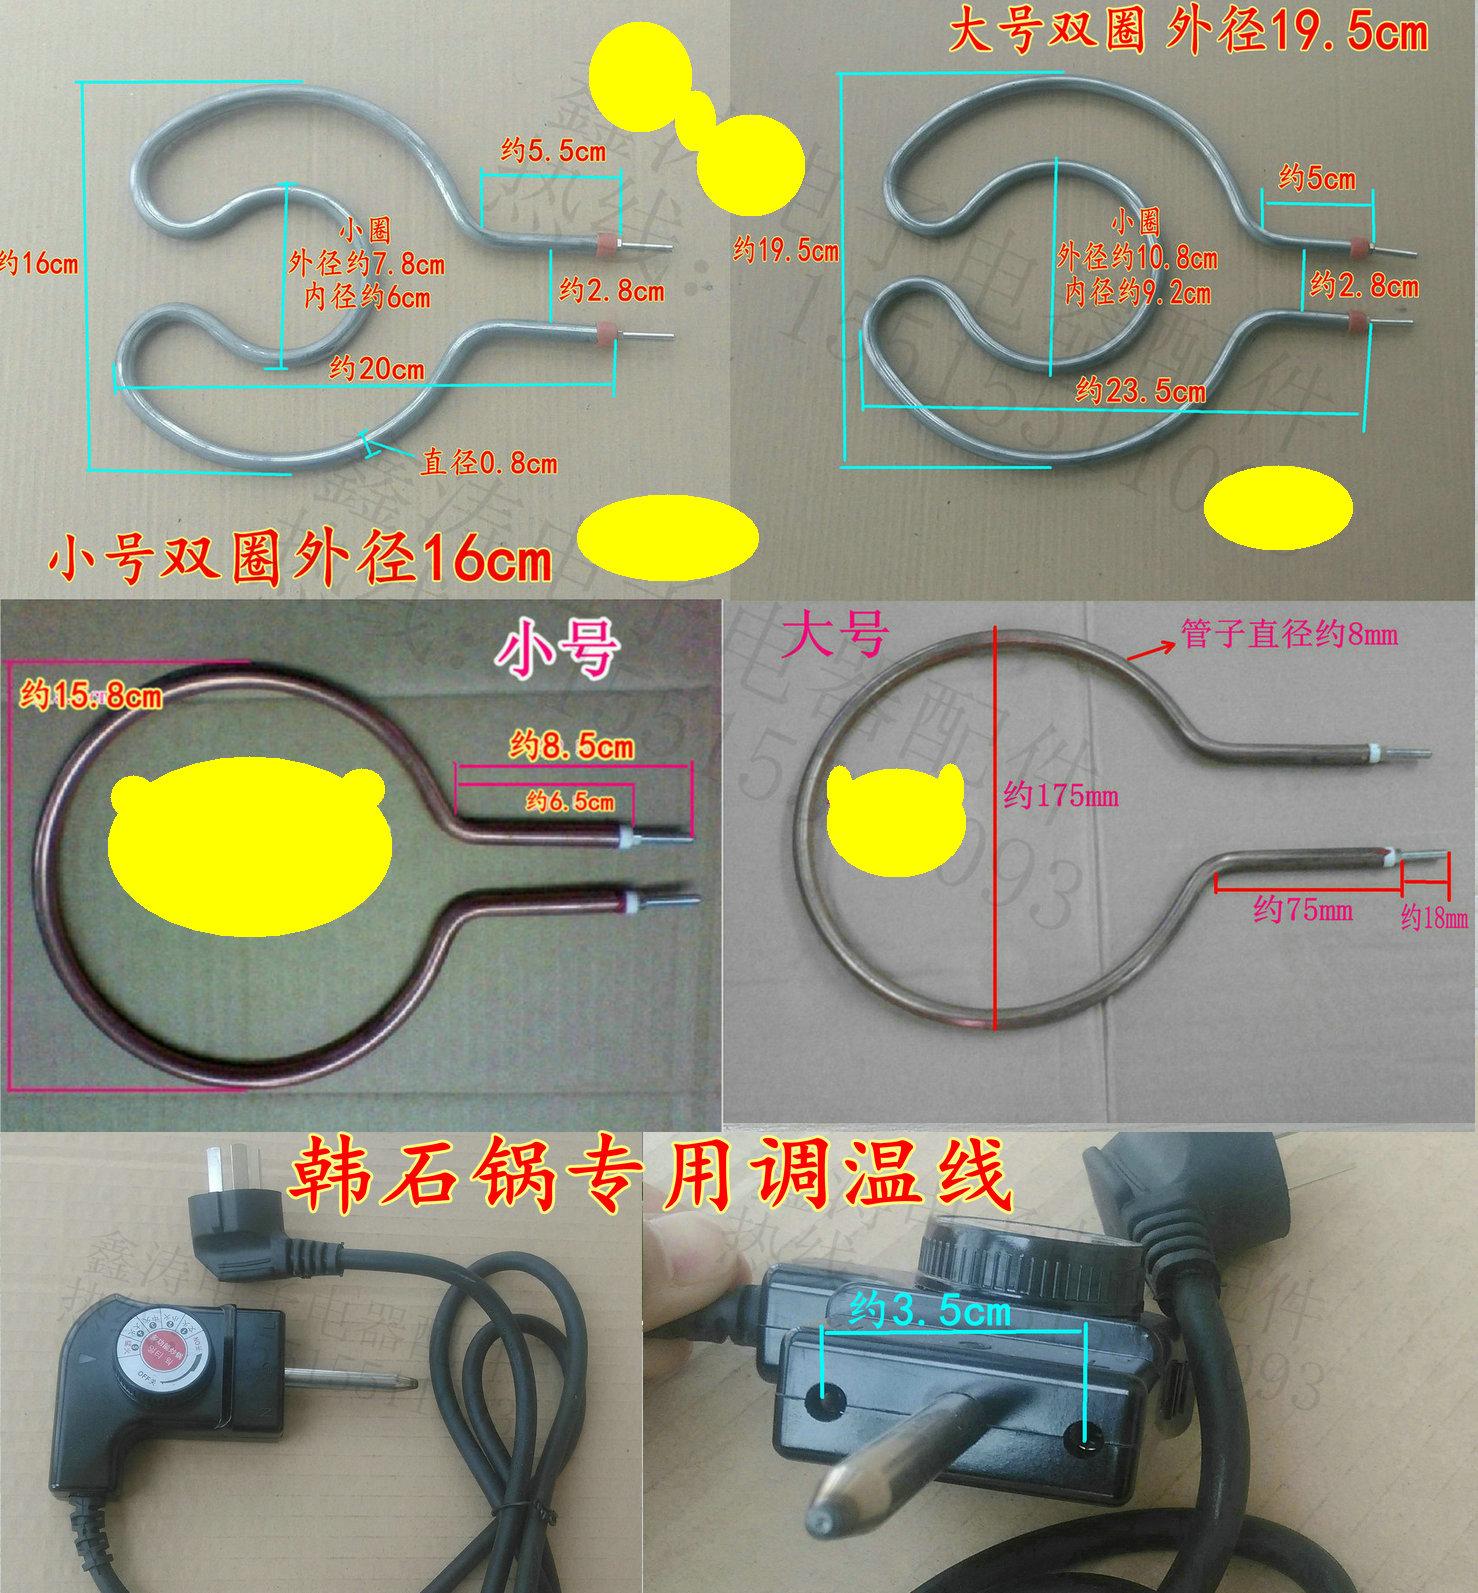 Koreanische Partei pan bratpfanne multi - Herd - backform heizung - fieber - elektrische heizung BAR -